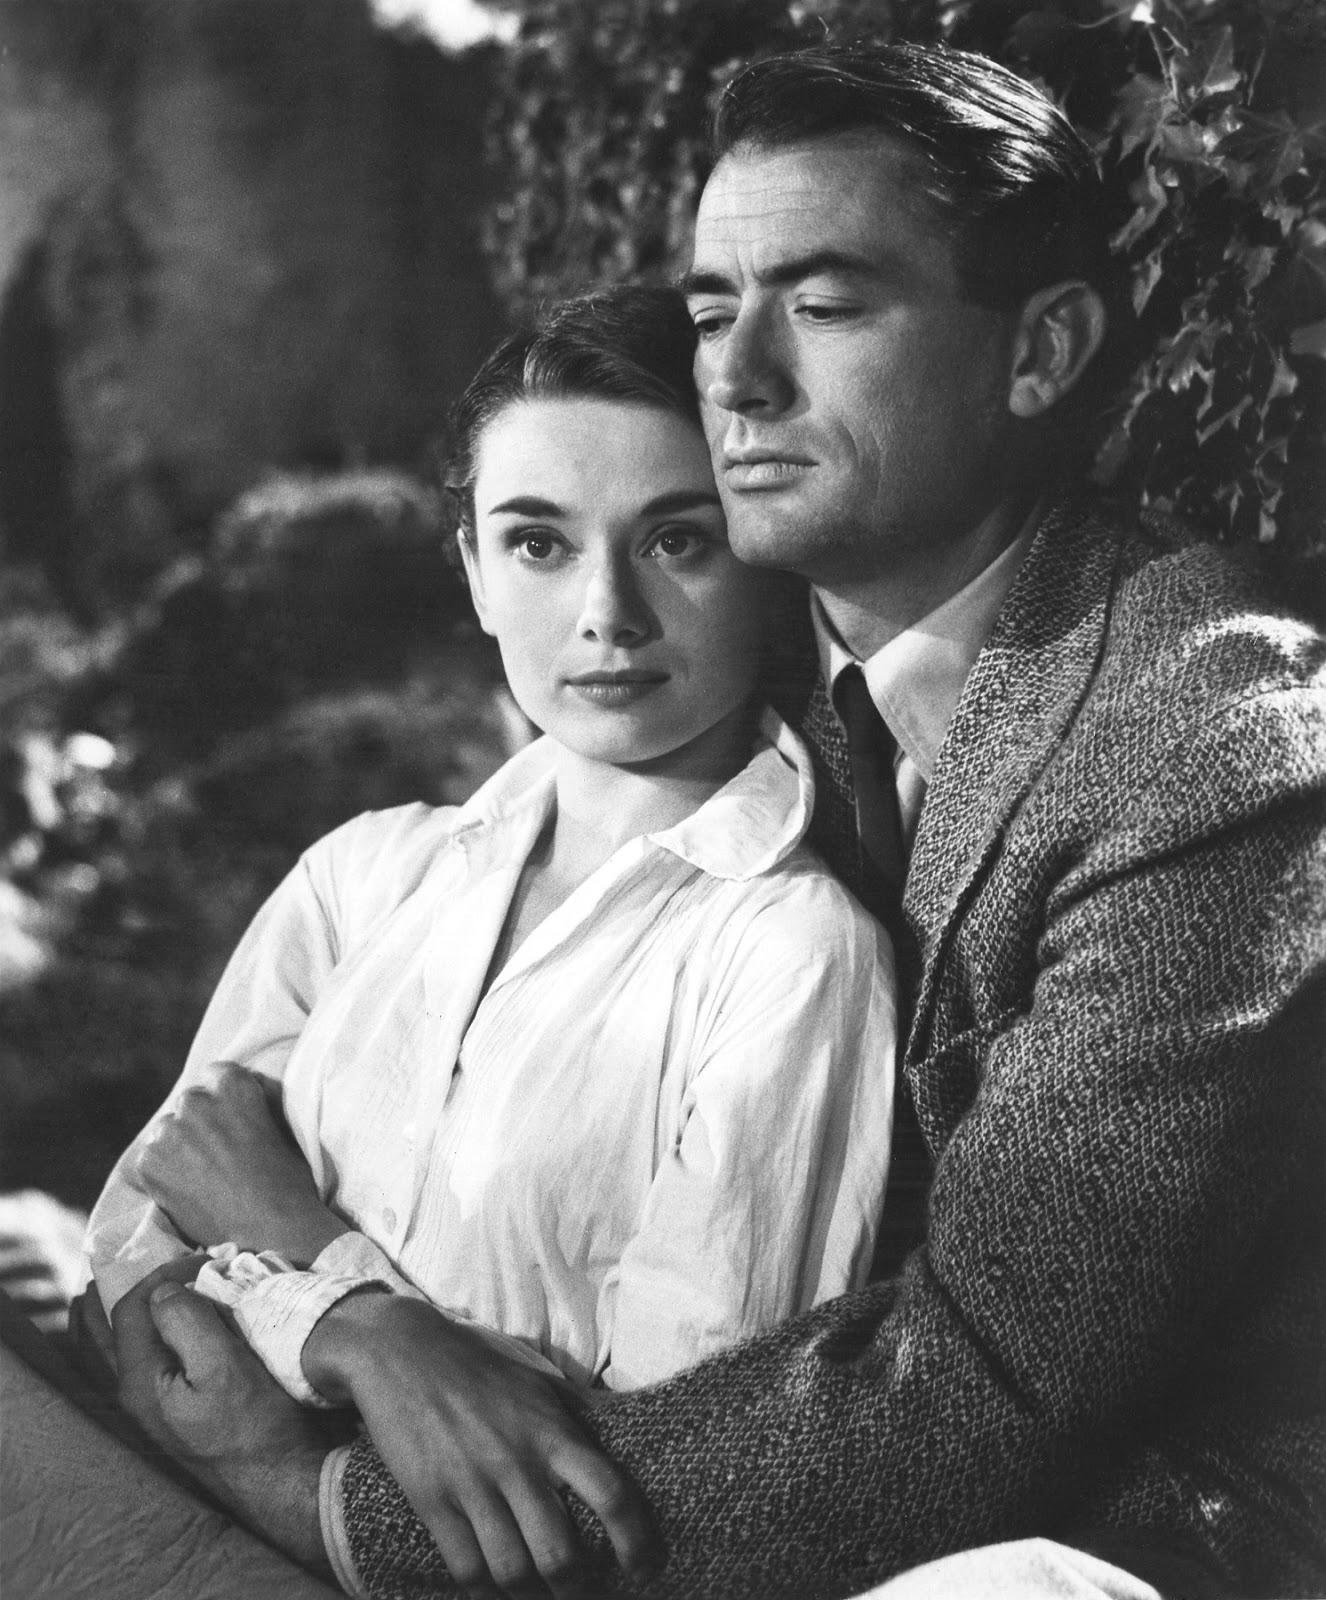 Roman Holiday. Audrey Hepburn & Gregory Peck - YouTube